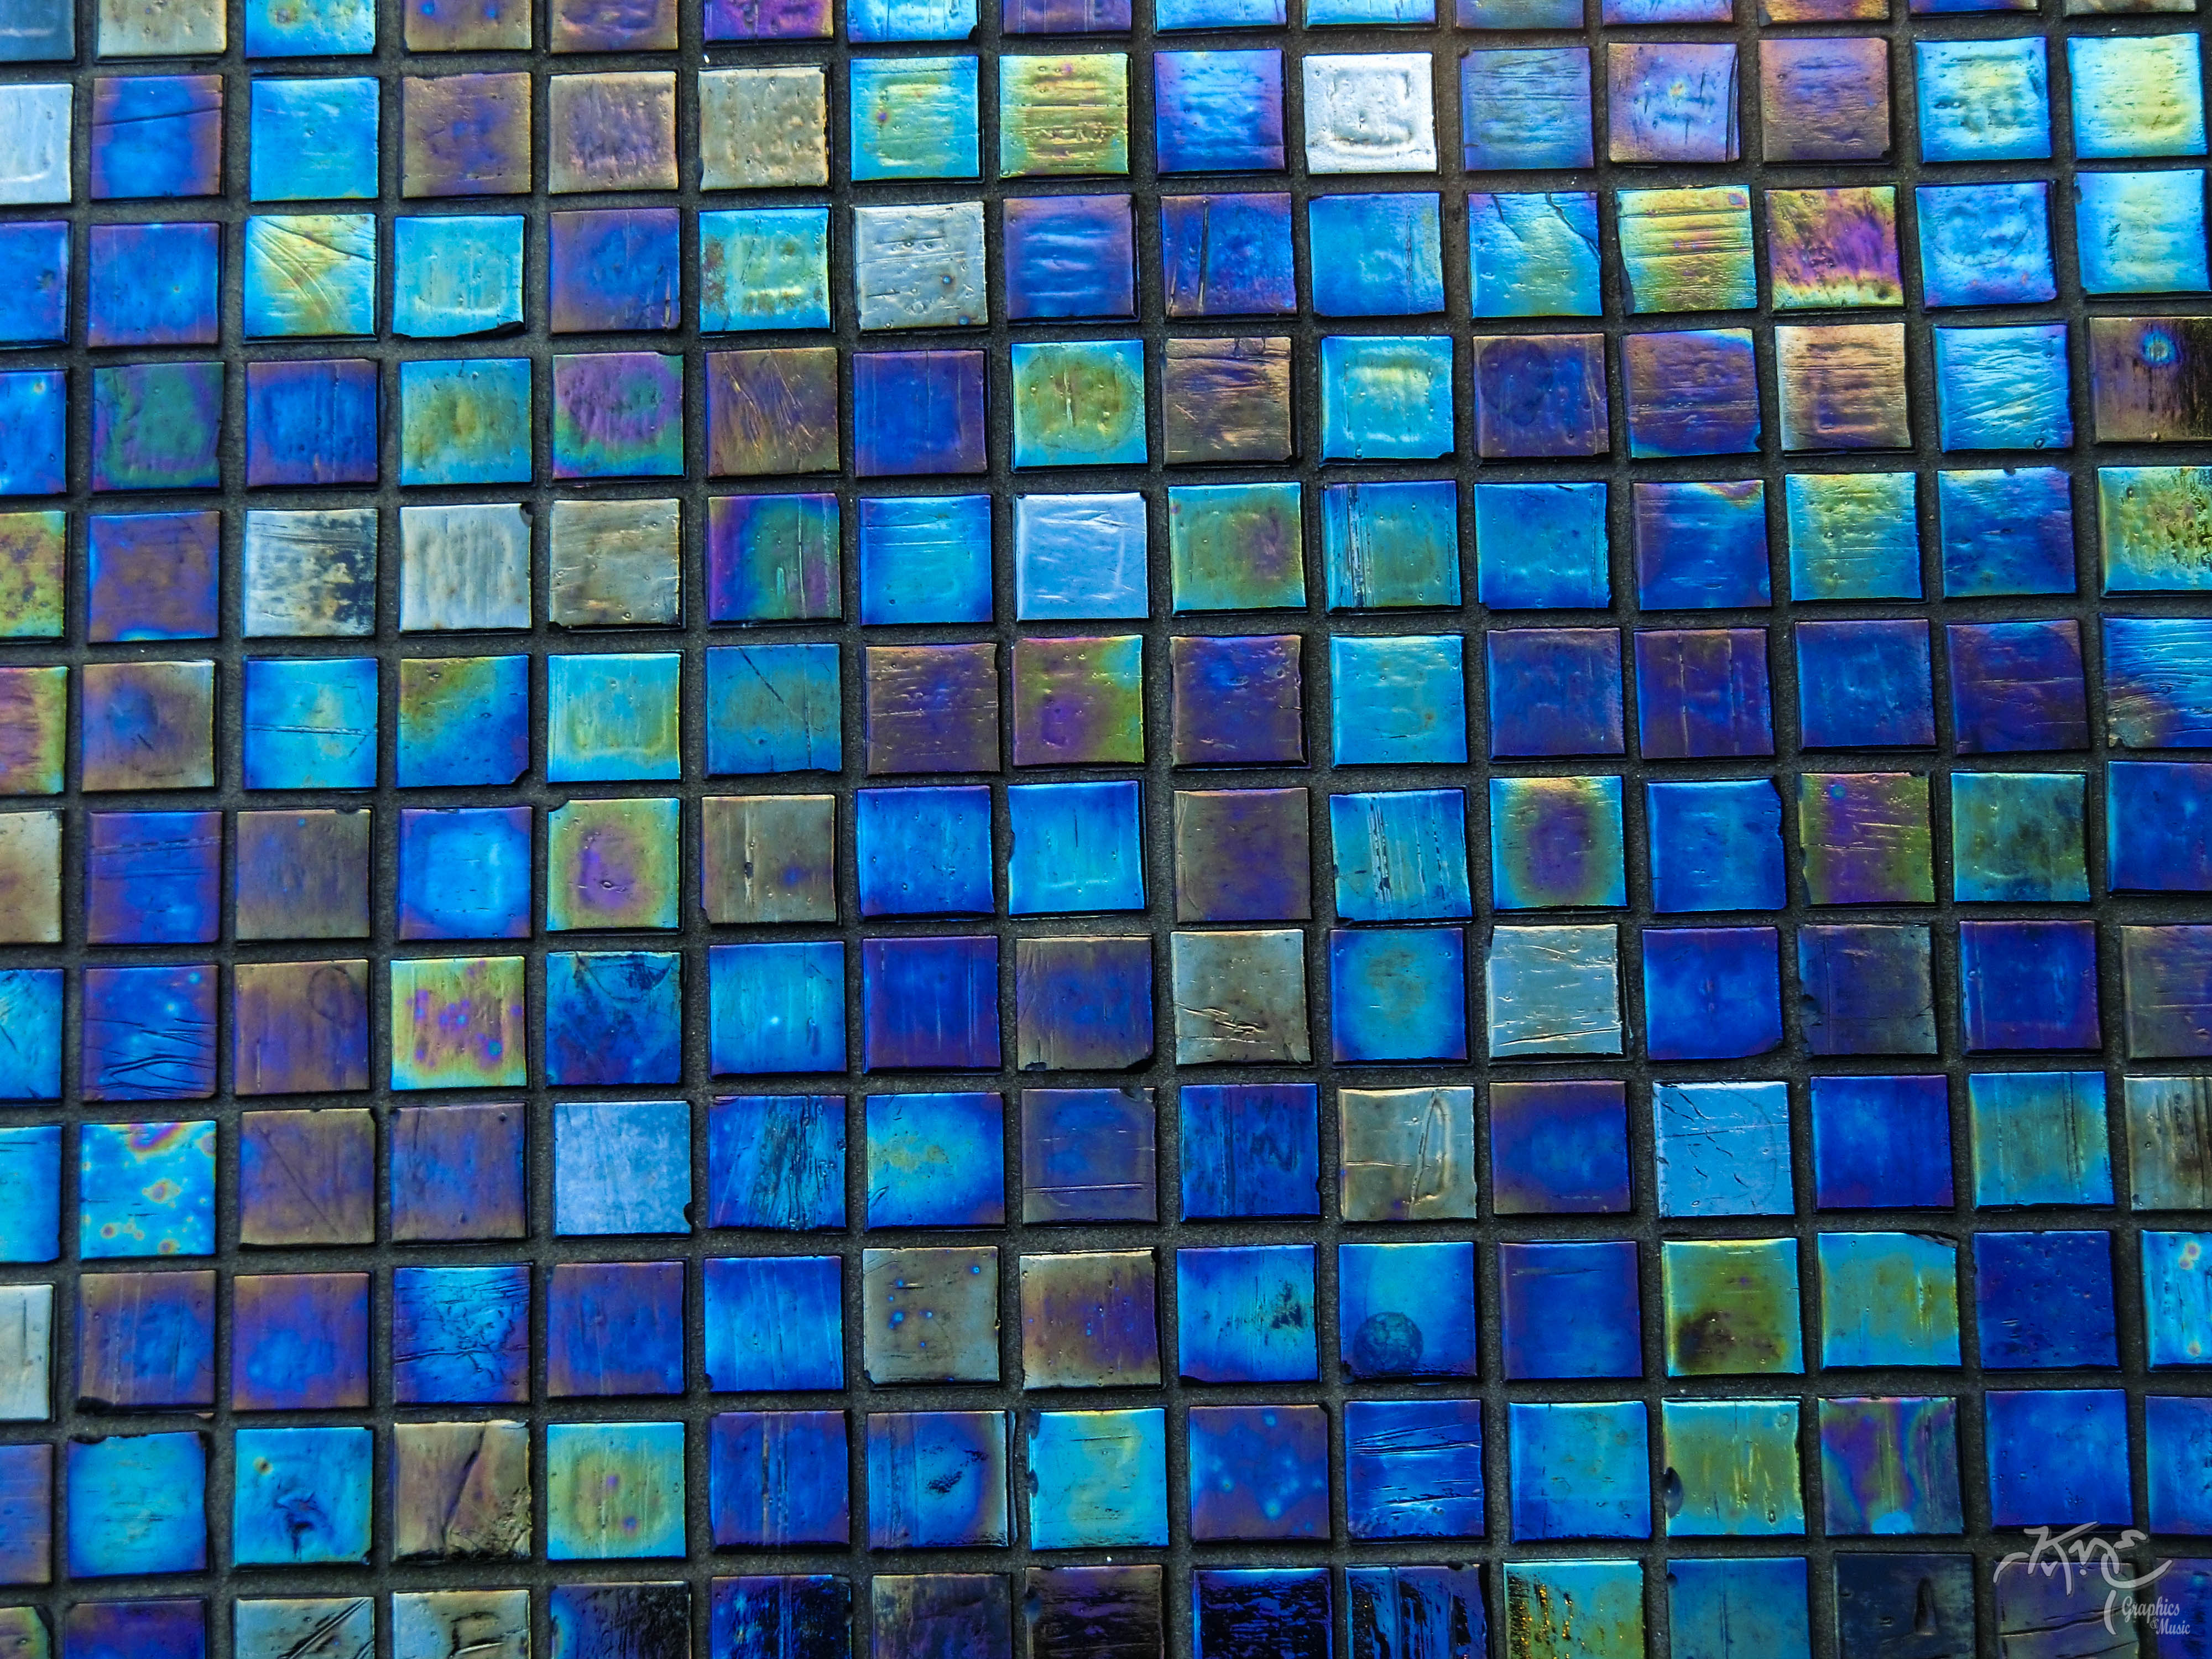 Iridescent Tiles | Shutterbug